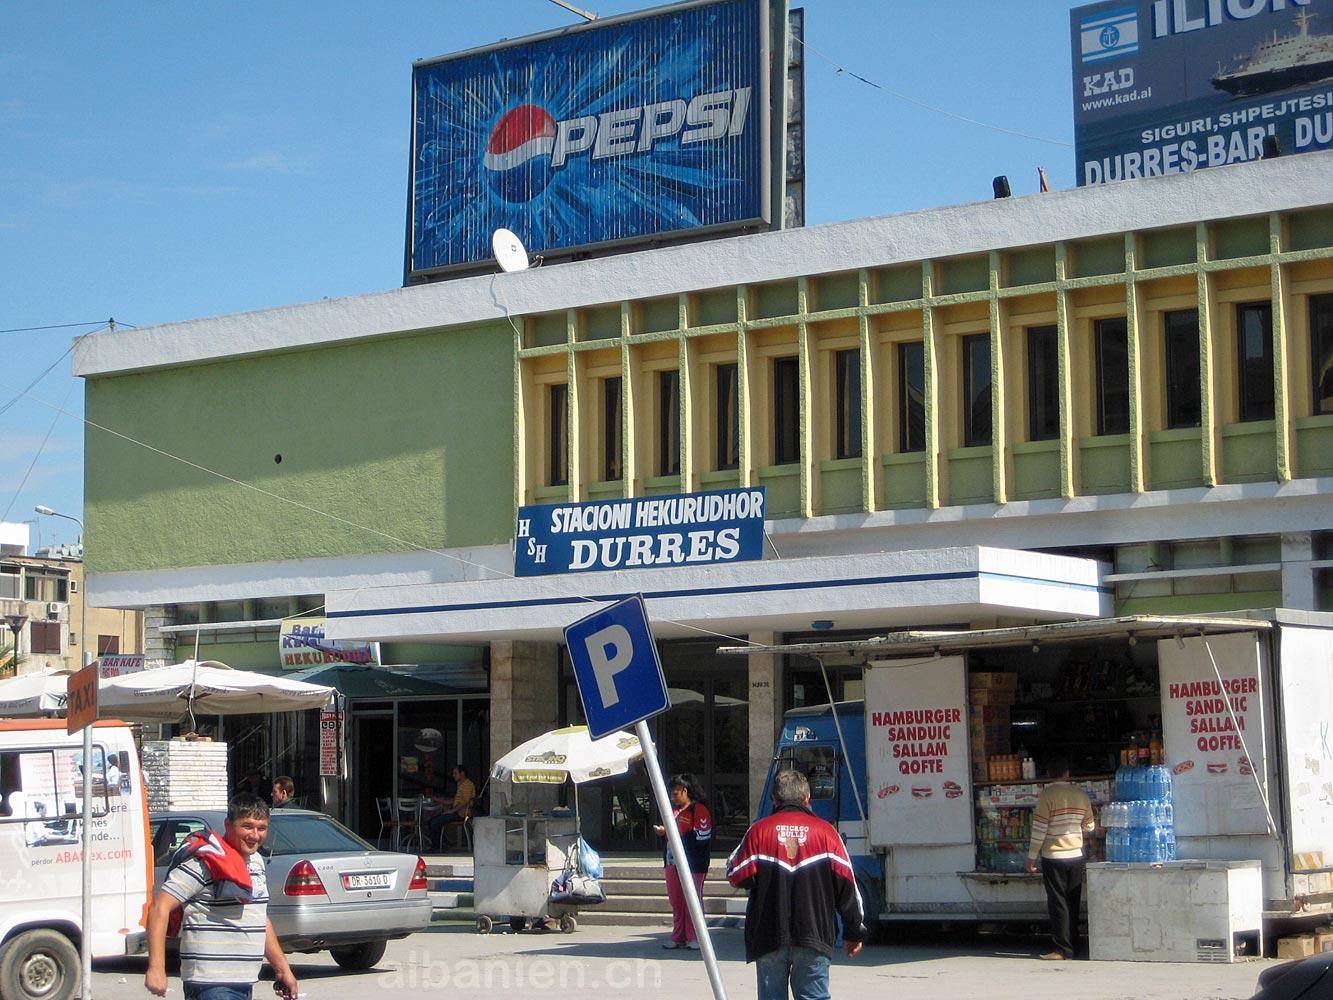 Durrës Bahnhof